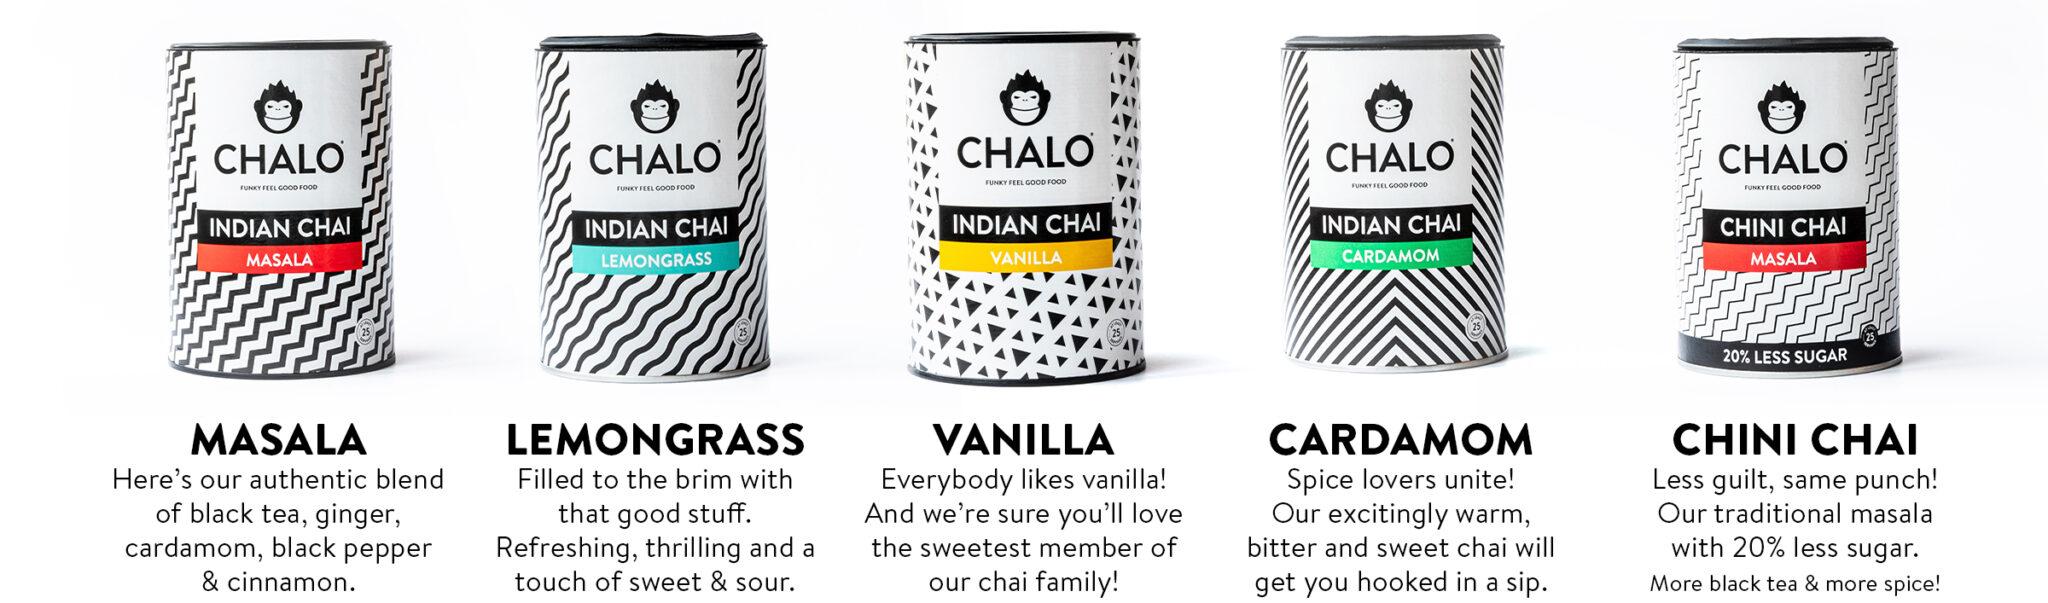 2020 Chalo chai latte flavour overview